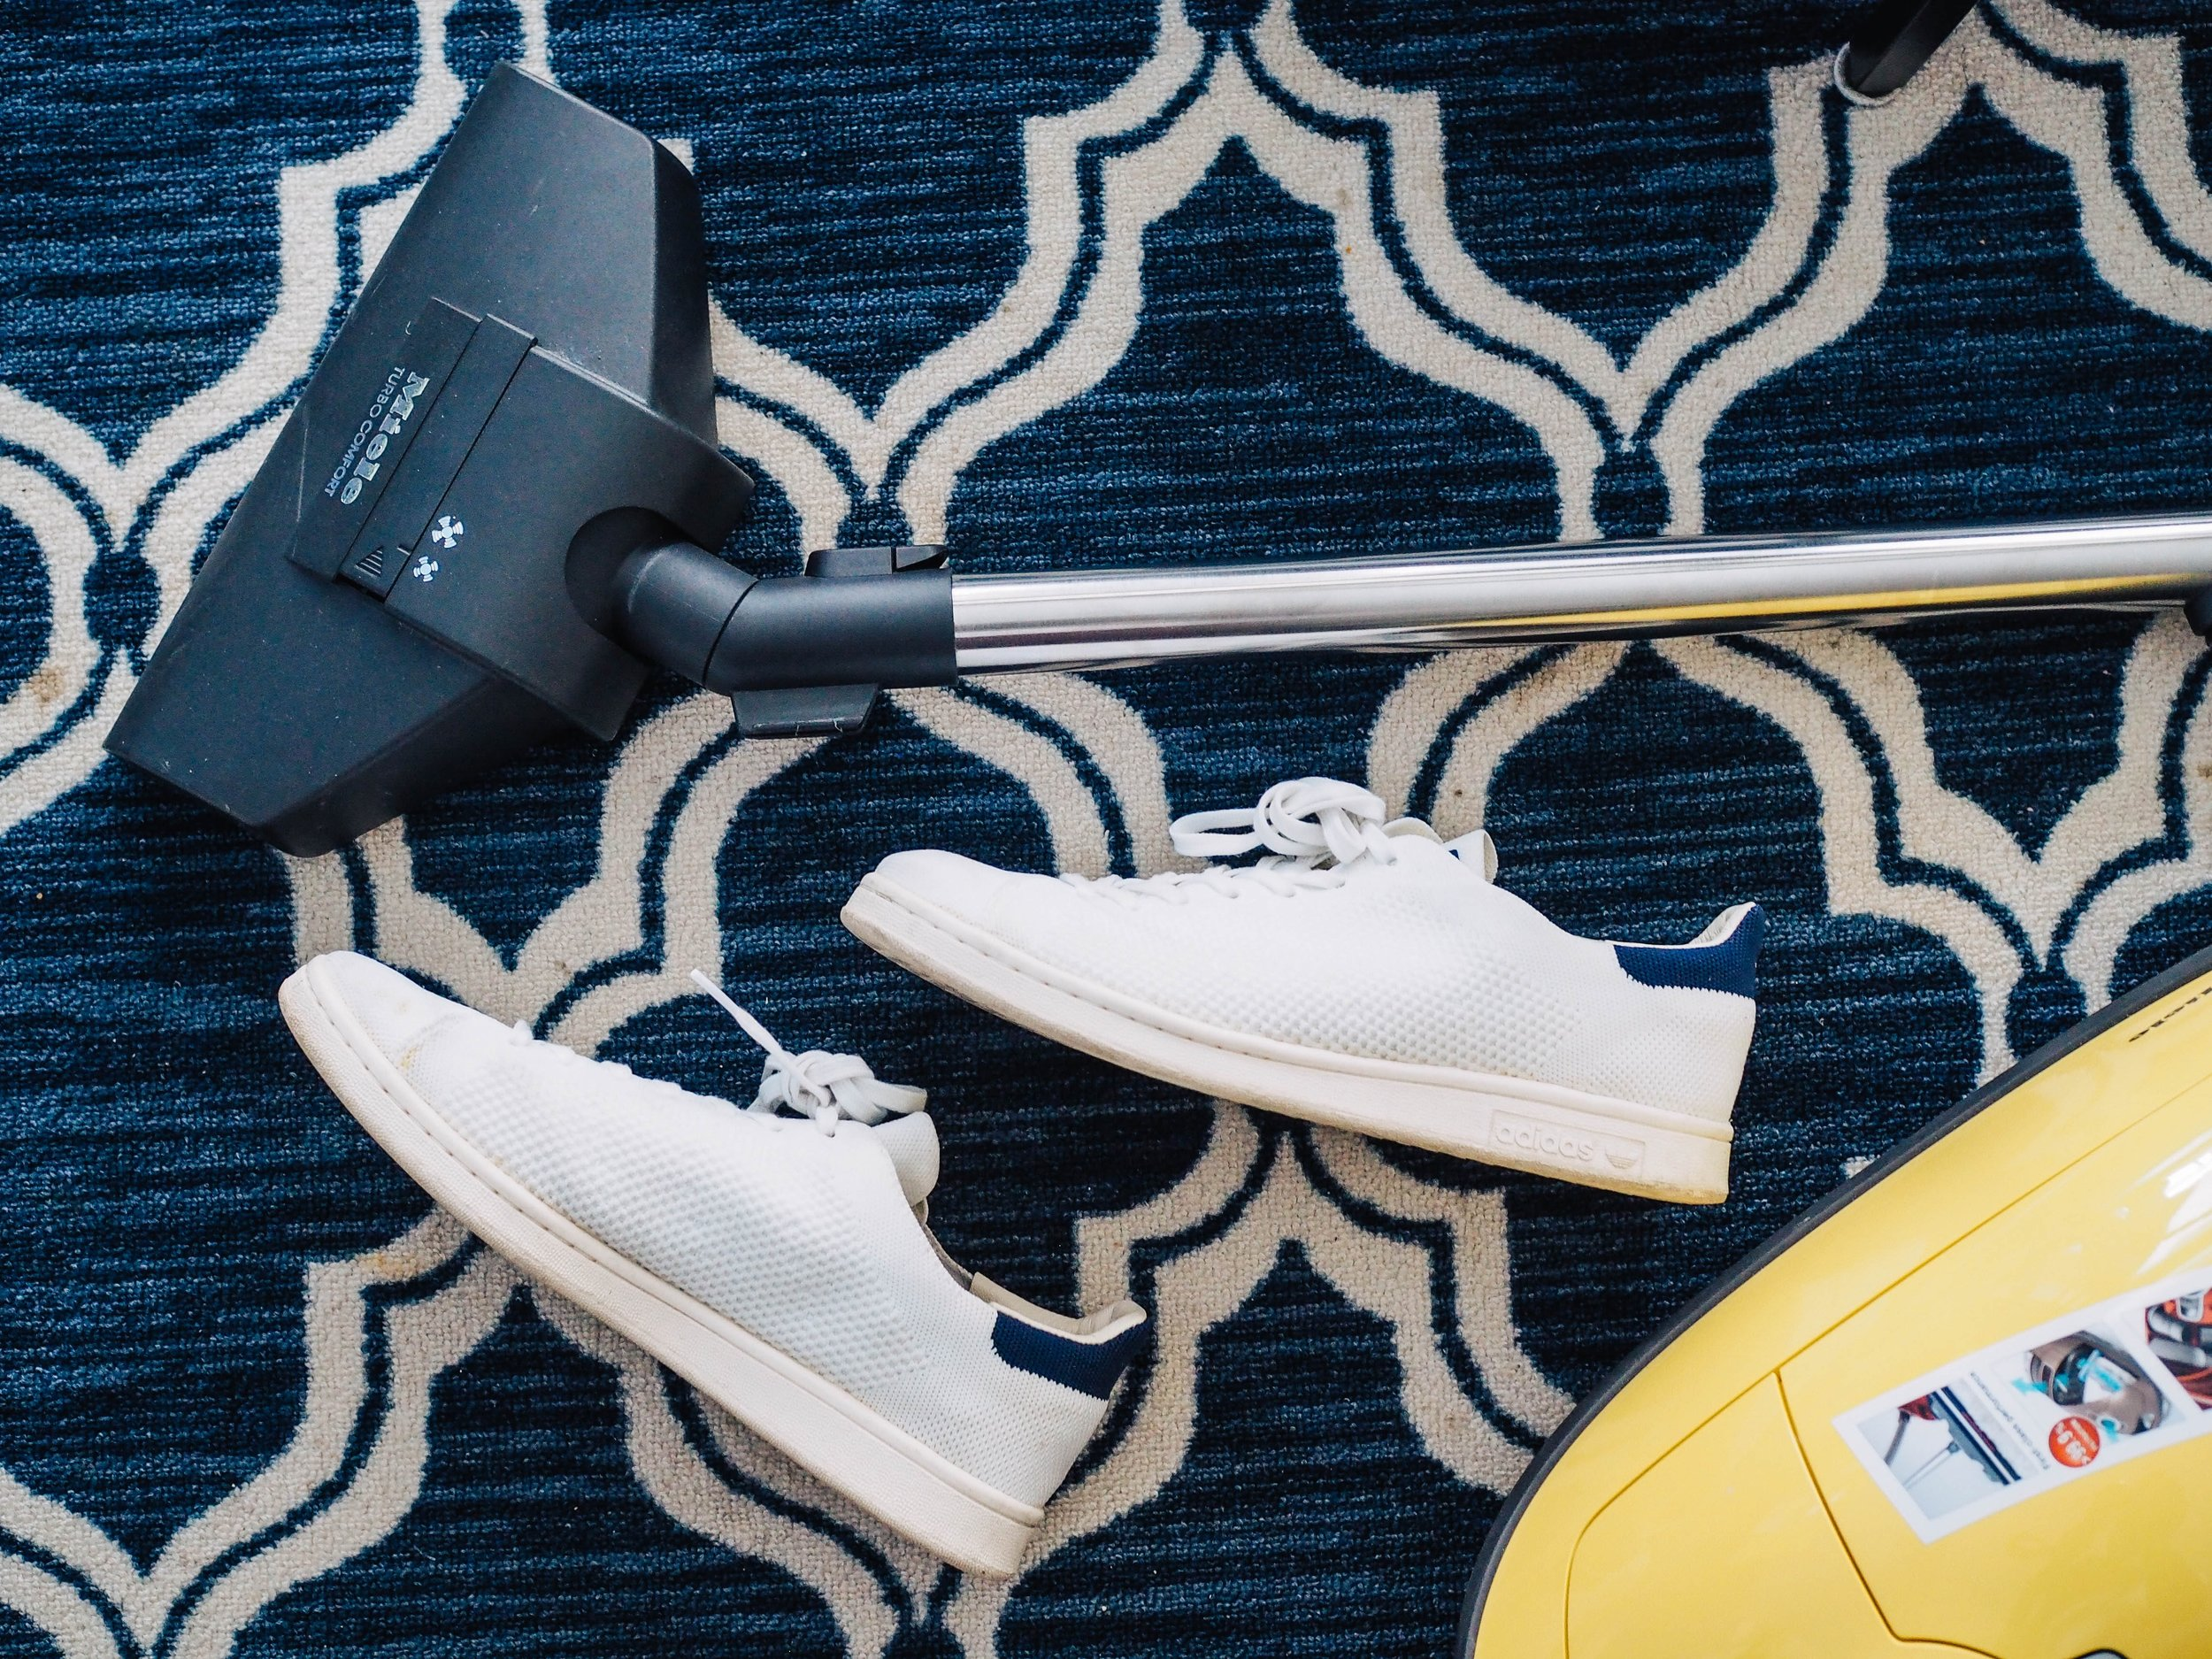 Things you forget to clean! #cleaning #housework #cleaningtips #allergies #homekeeping